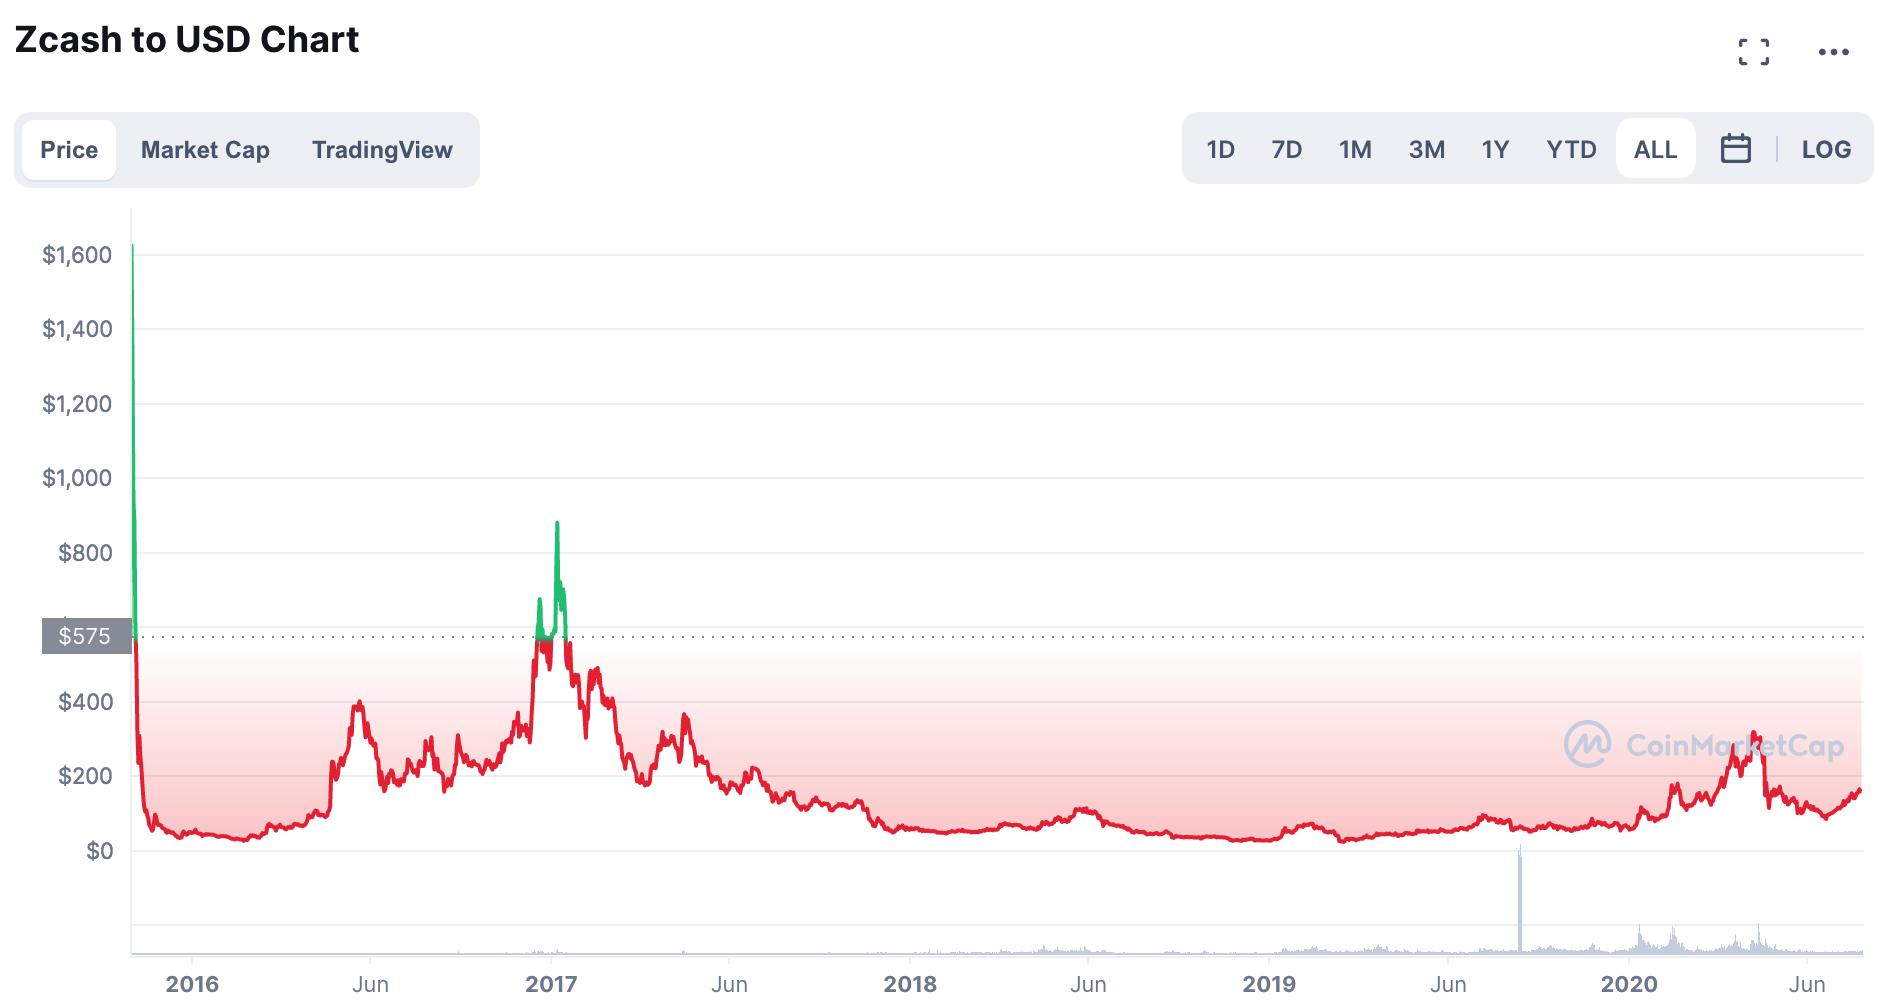 Zcash/USD - gráfico semanal (Fonte: CoinMarketCap)